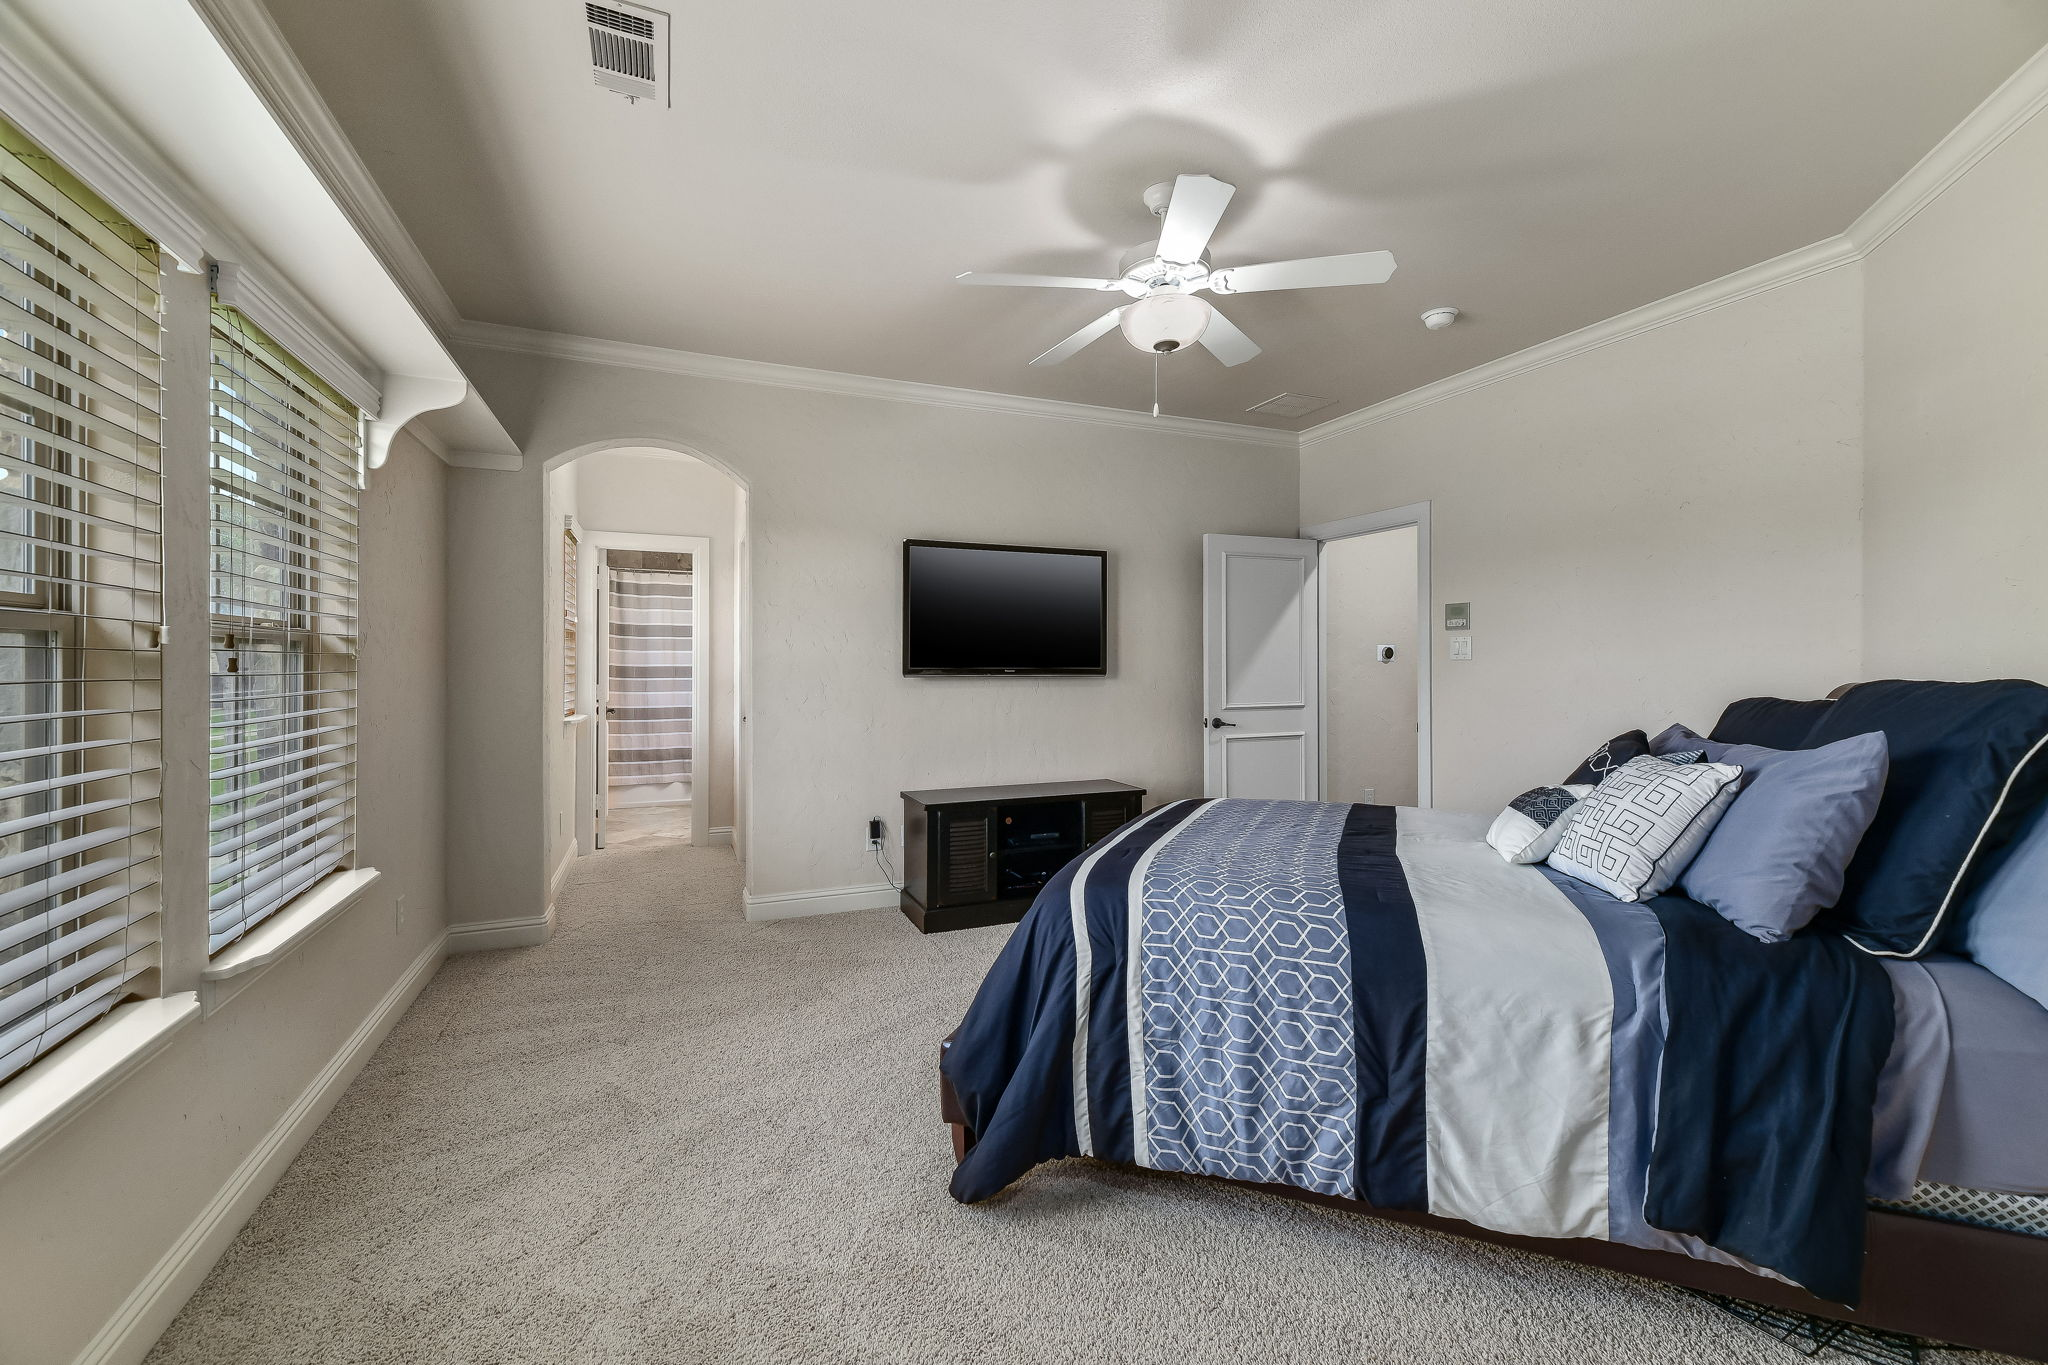 038-Bedroom 6-FULL